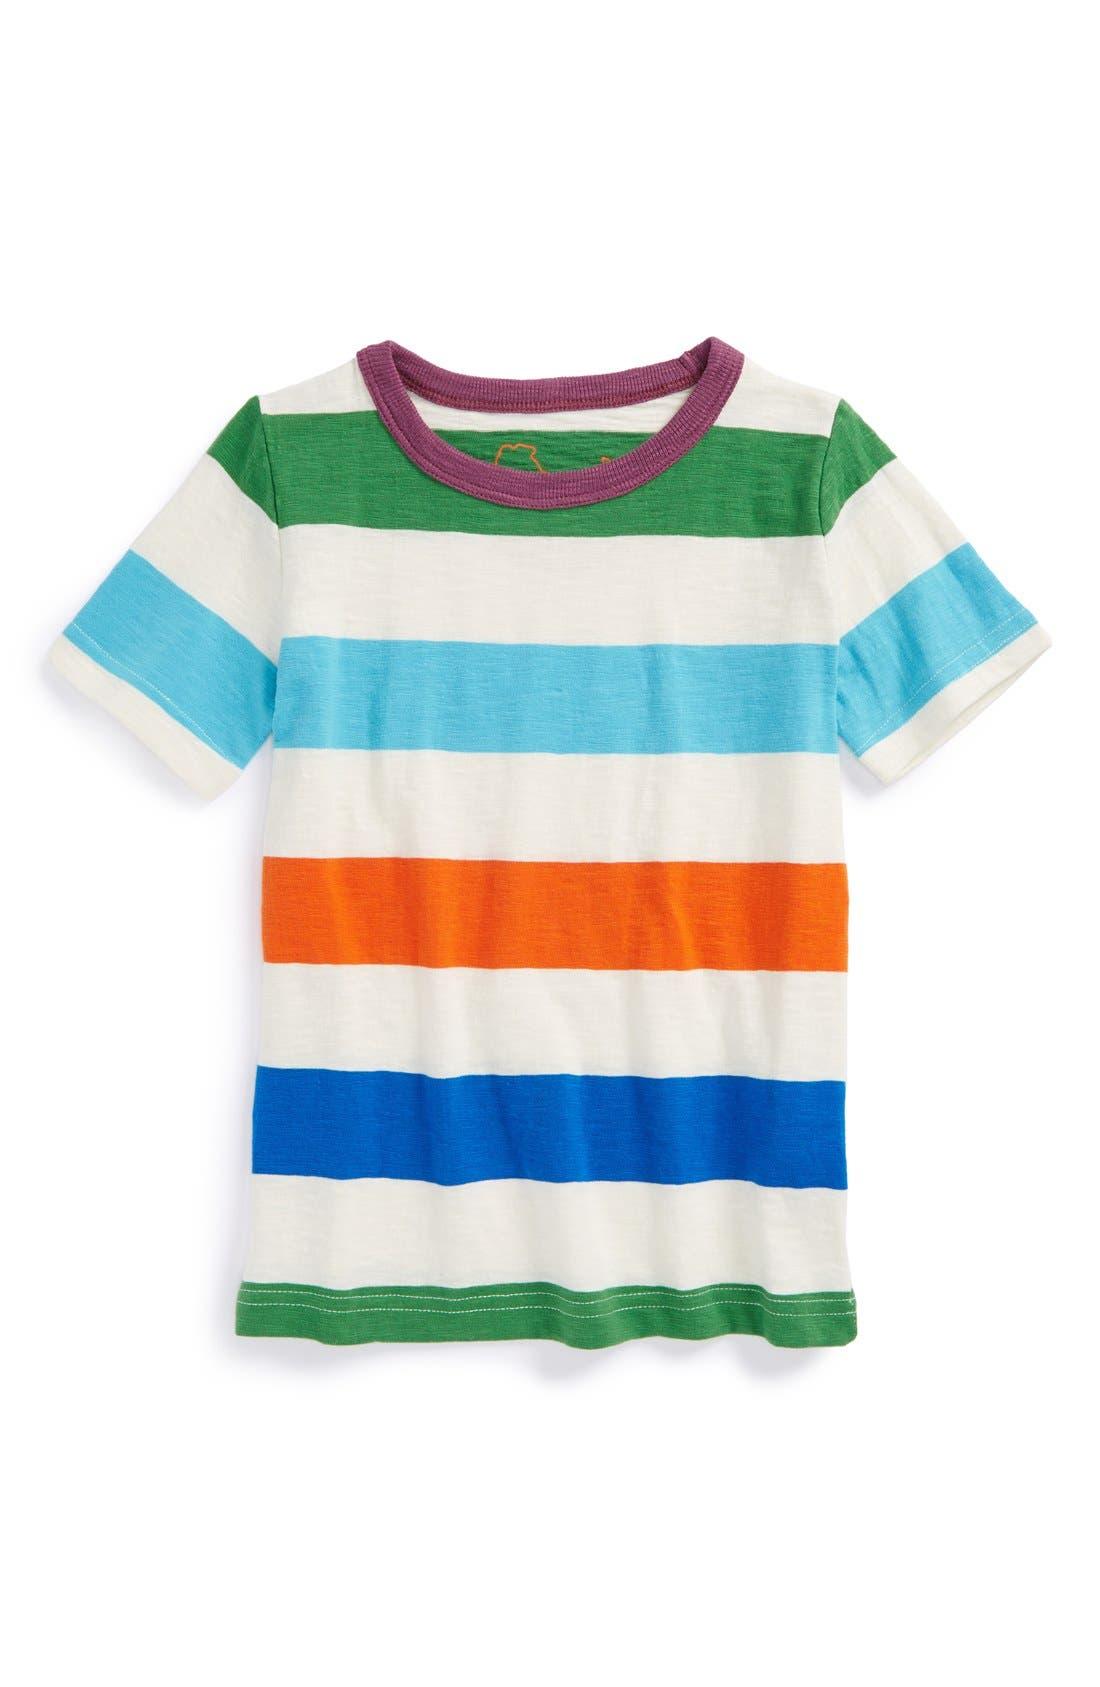 Alternate Image 1 Selected - Mini Boden 'Stripy' Cotton Jersey T-Shirt (Toddler Boys, Little Boys & Big Boys)